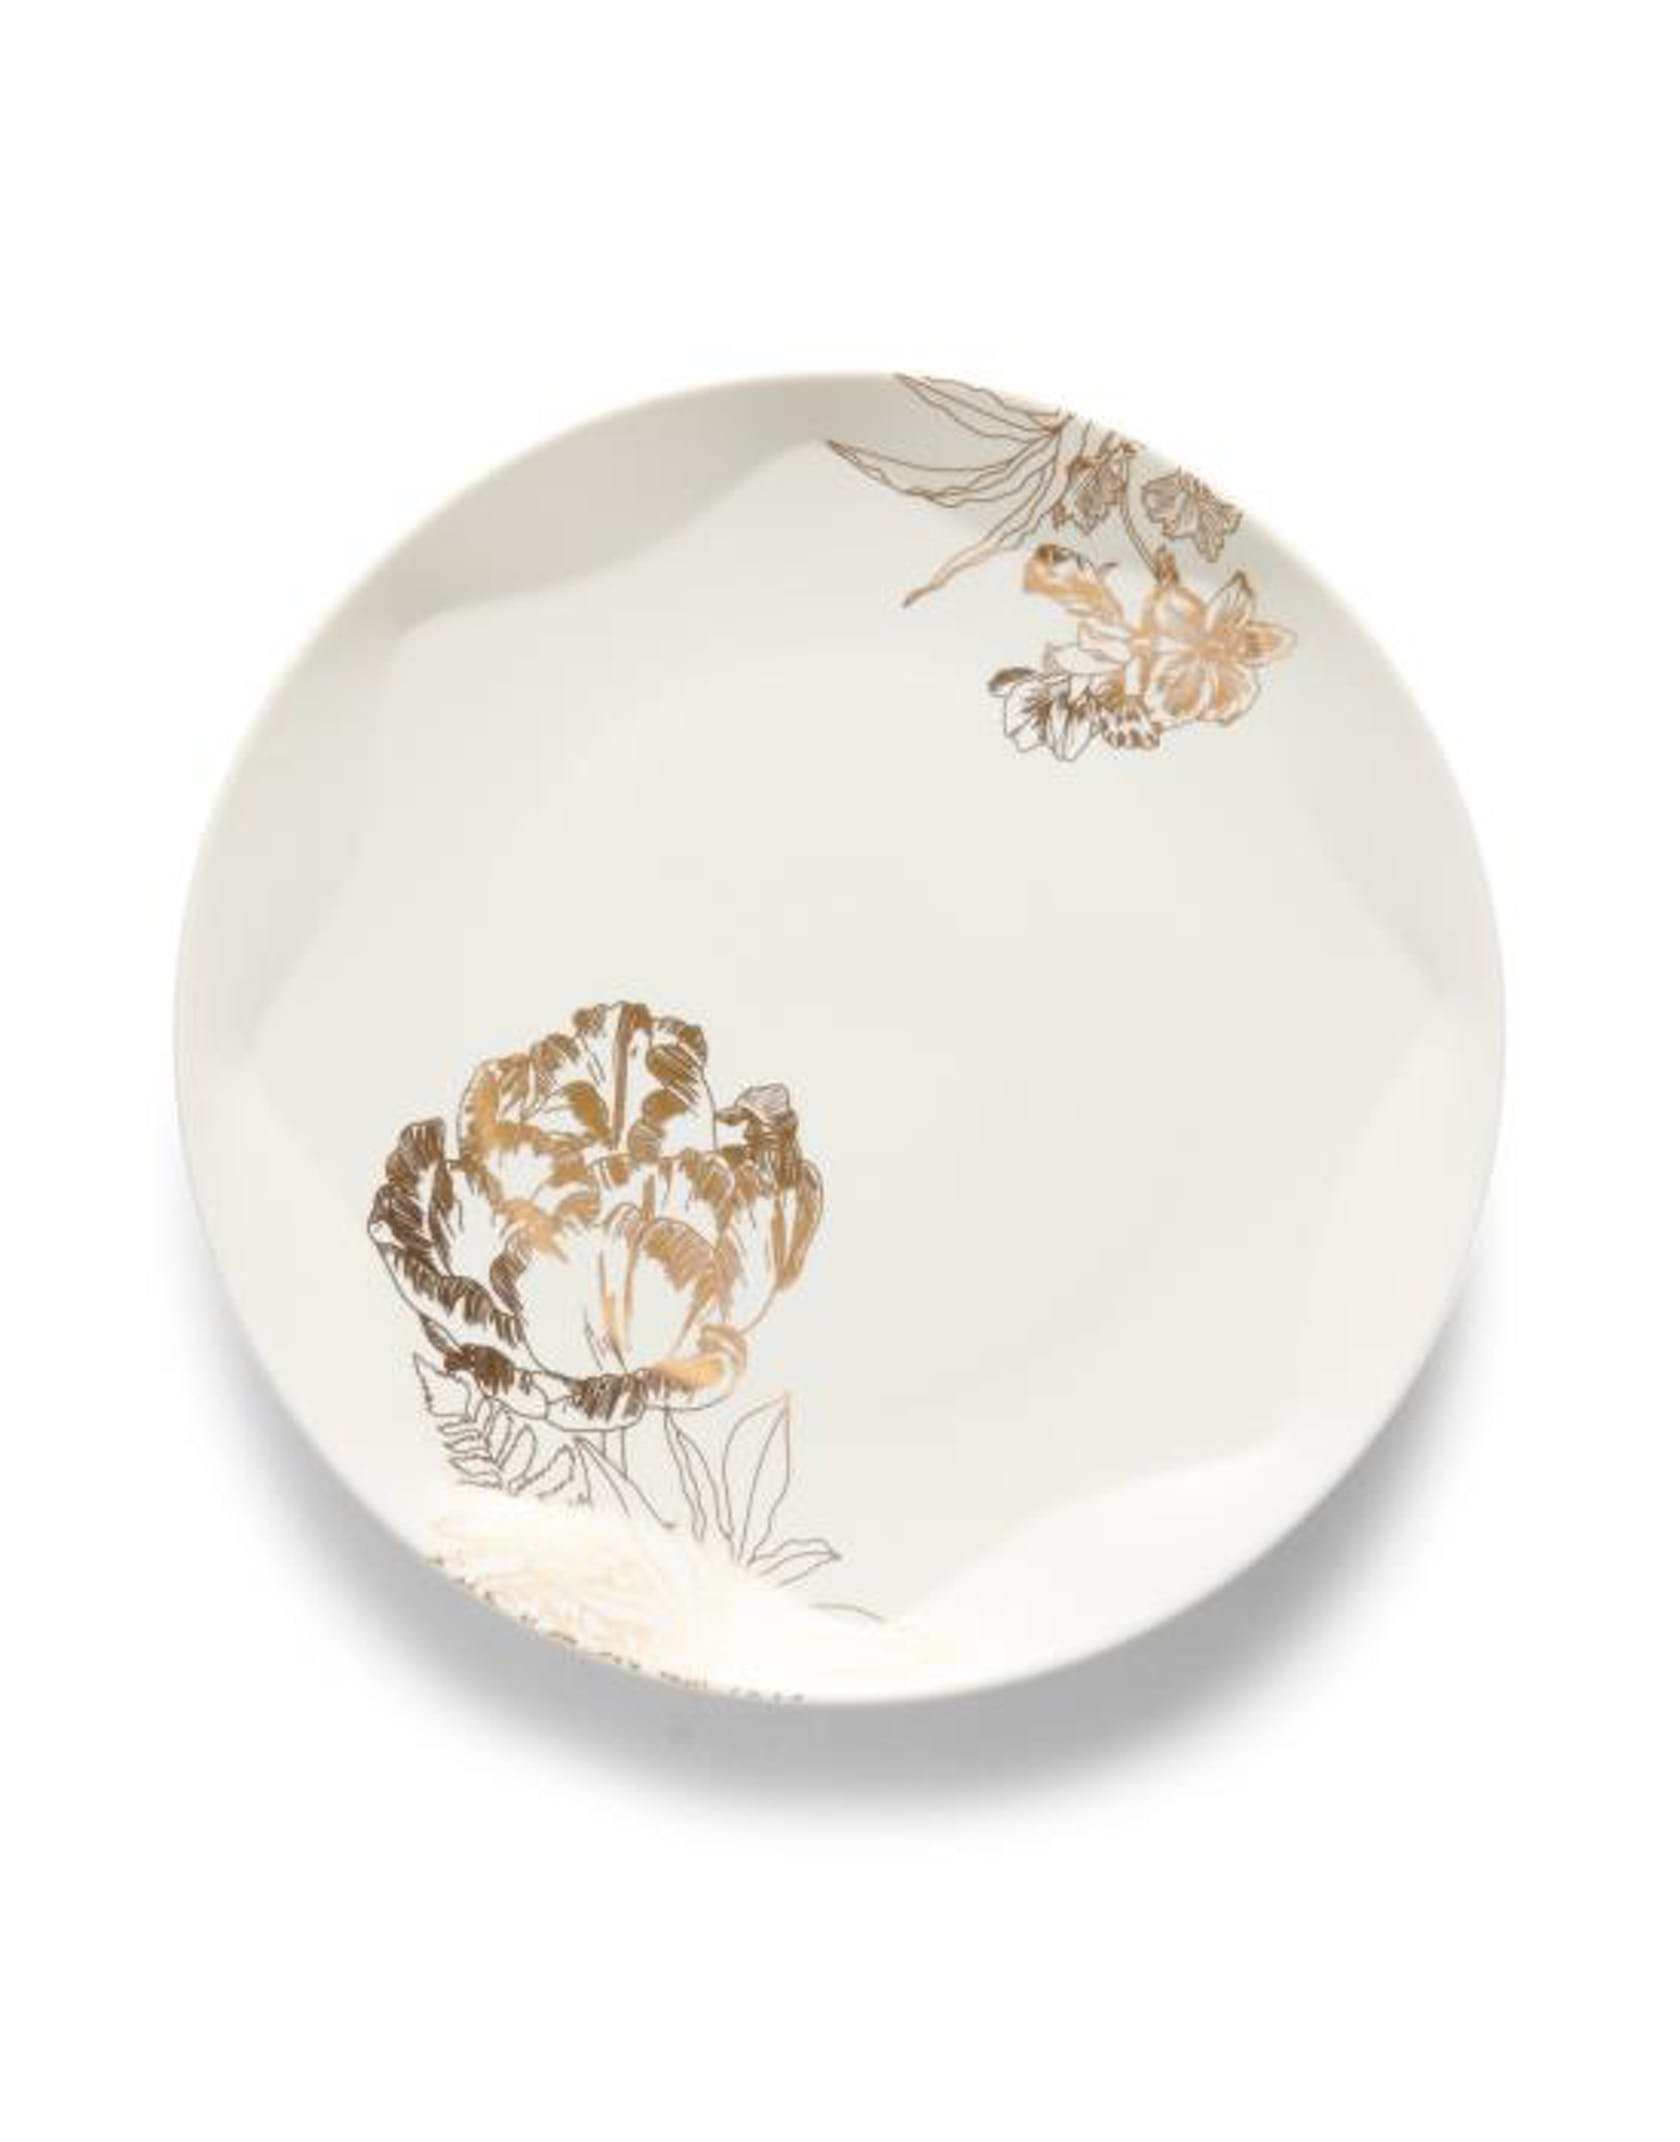 ESSENZA Masterpiece Off white Cake plate 17